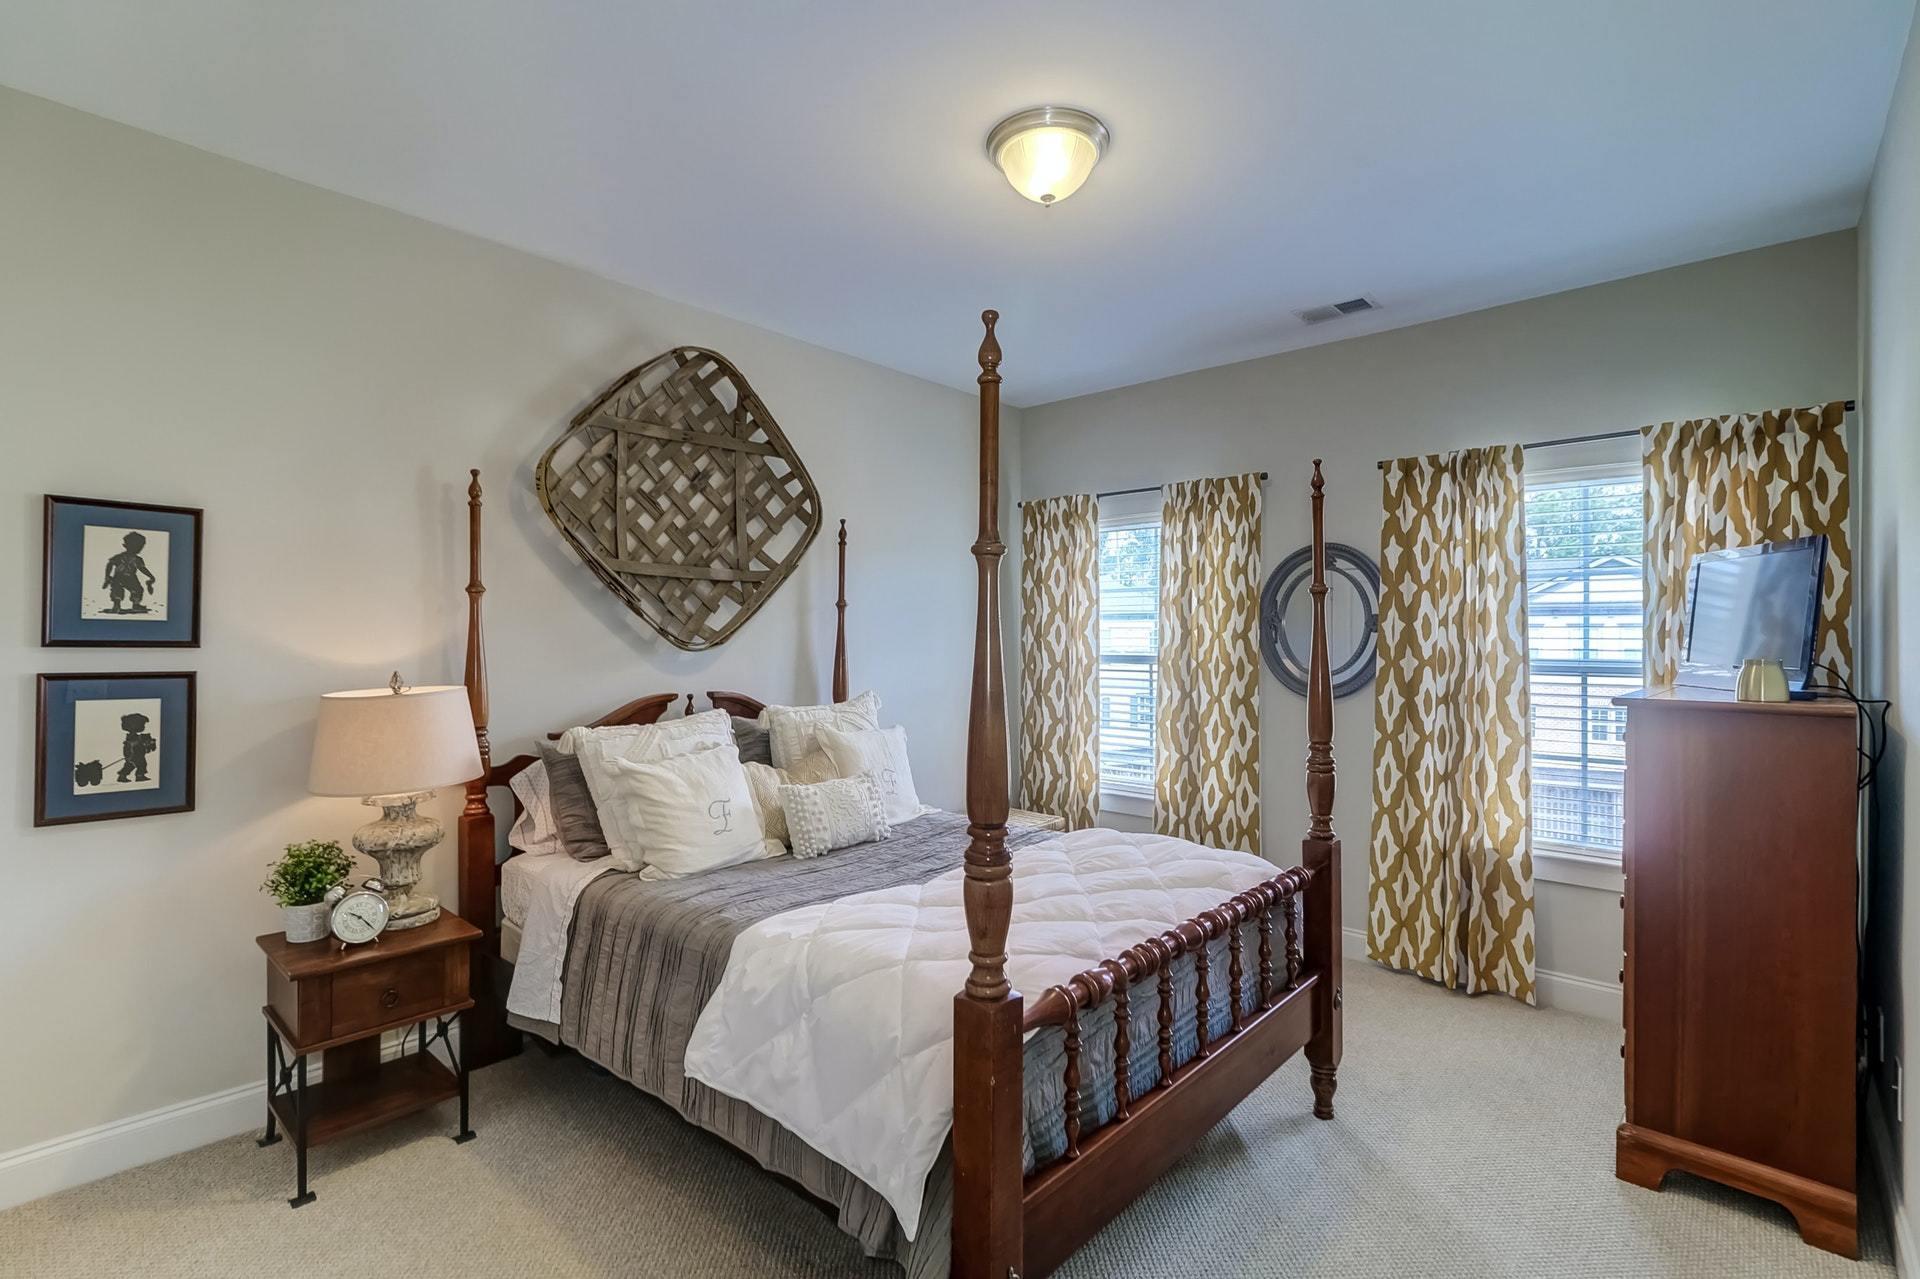 Etiwan Pointe Homes For Sale - 220 Slipper Shell, Mount Pleasant, SC - 13